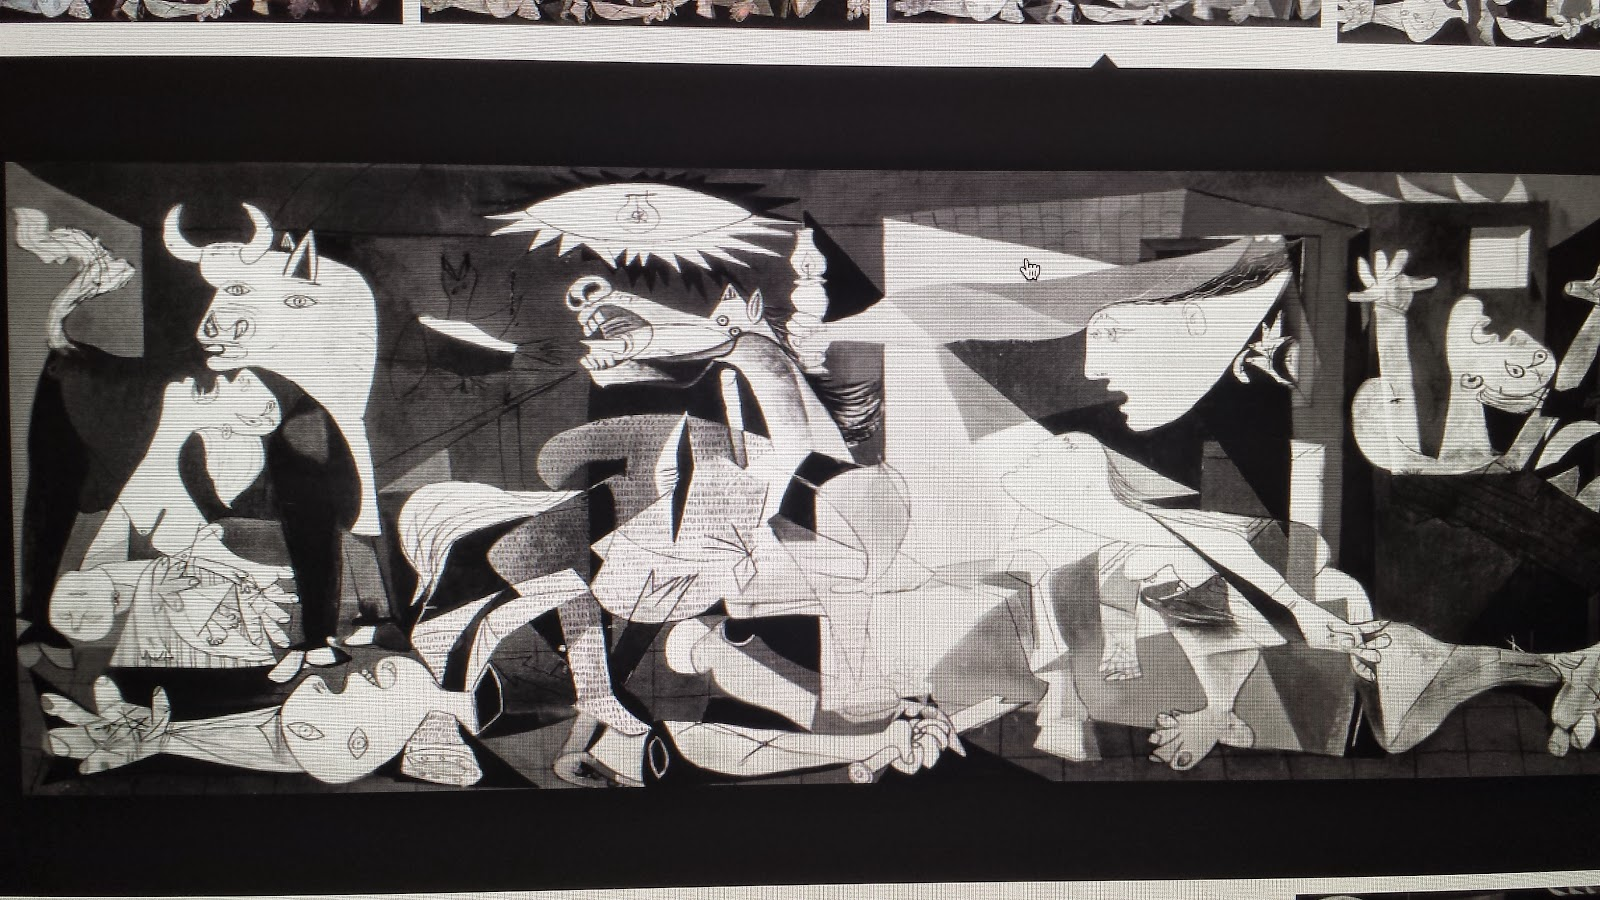 Humanities Period 4 Blog 3 Picassos Guernica